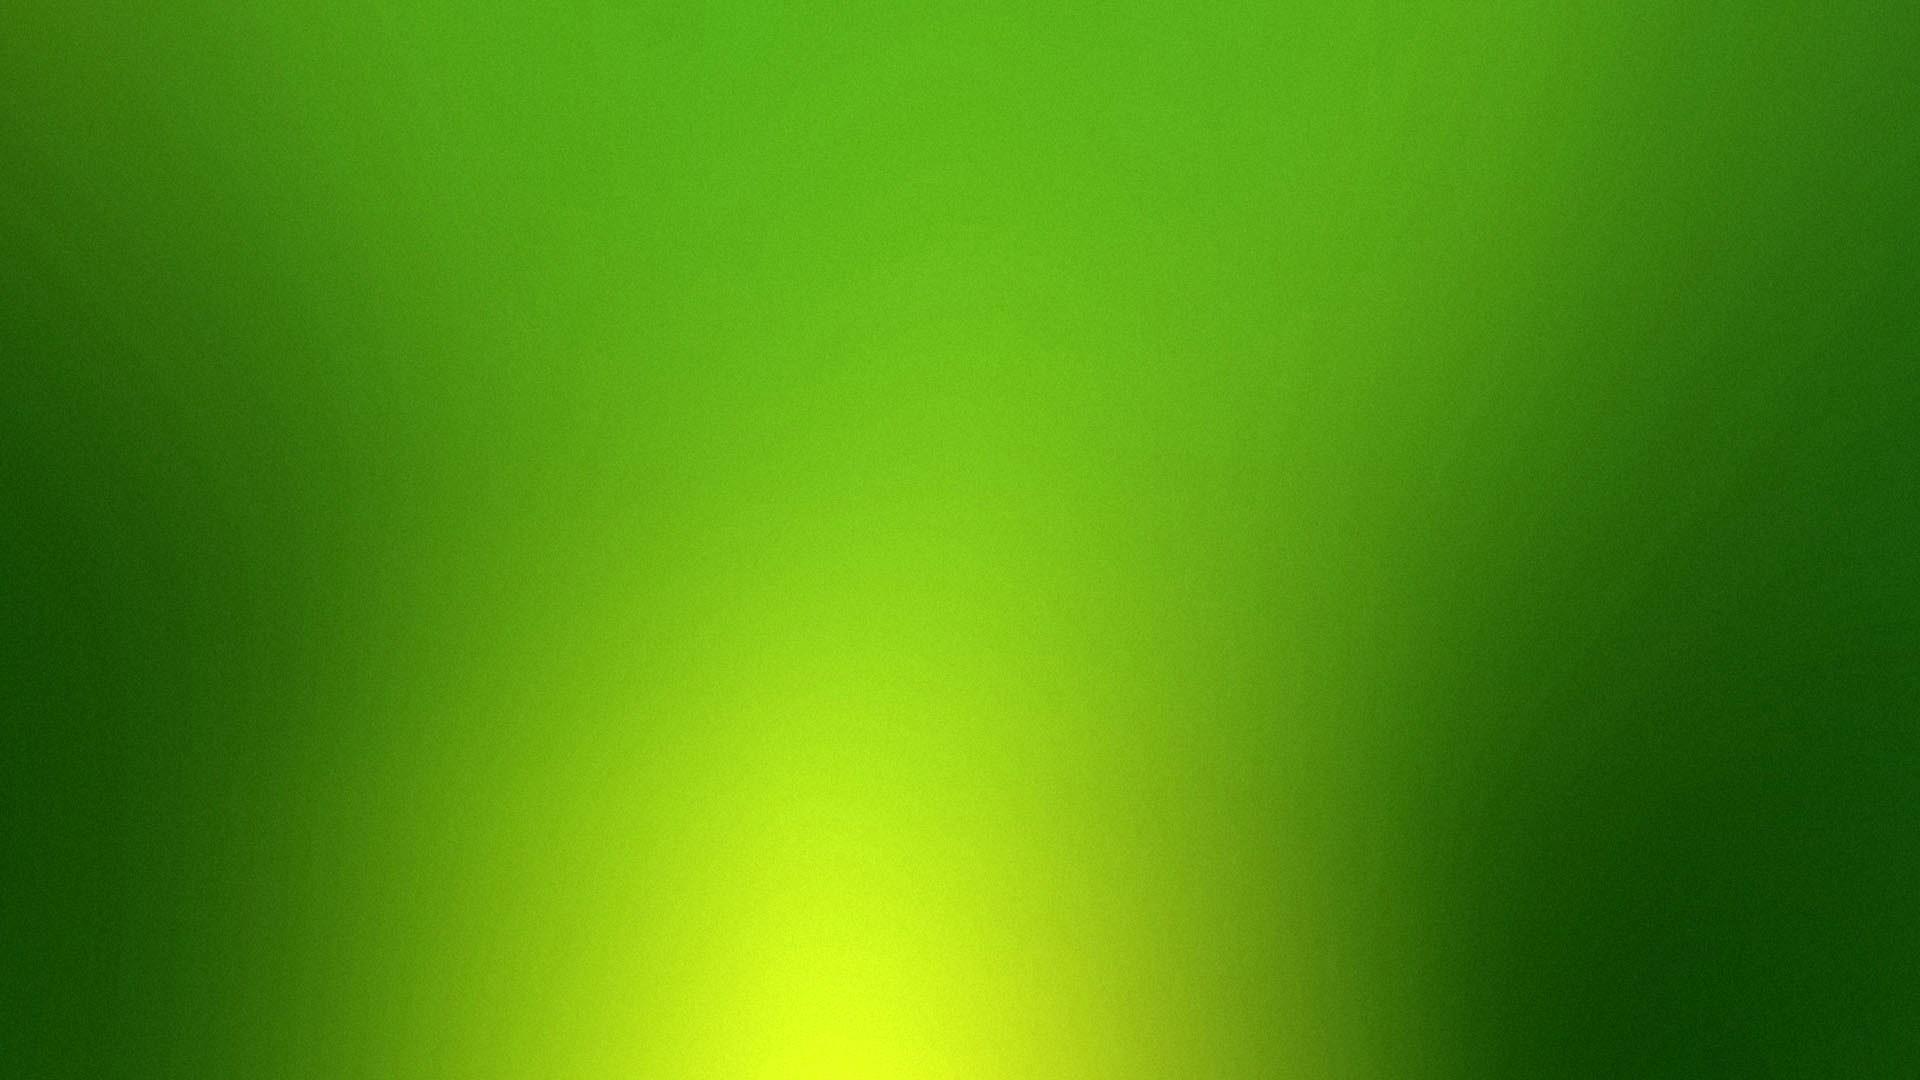 Download Light Green Background 31851 1920x1080 px High 1920x1080